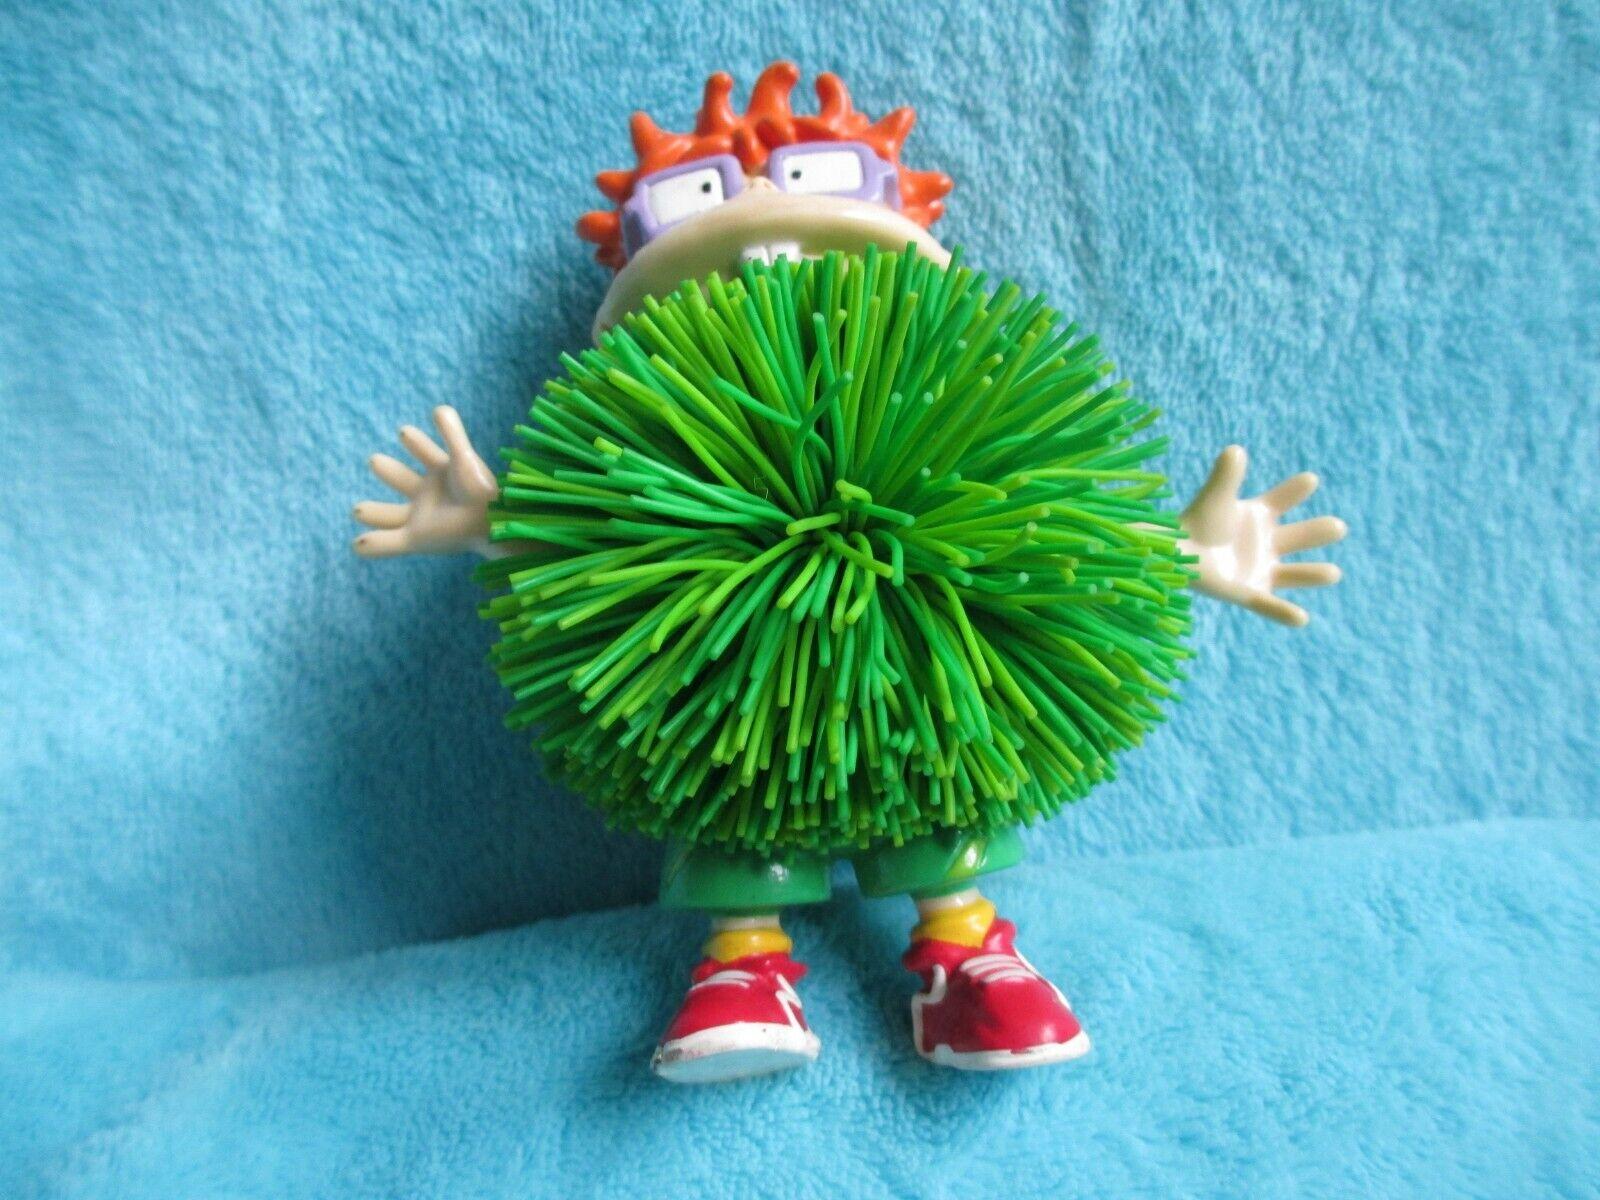 1998 OddzOn Rugrats - CHUCKIE FINSTER - 4  Practice Tennis Koosh Ball Figure Toy